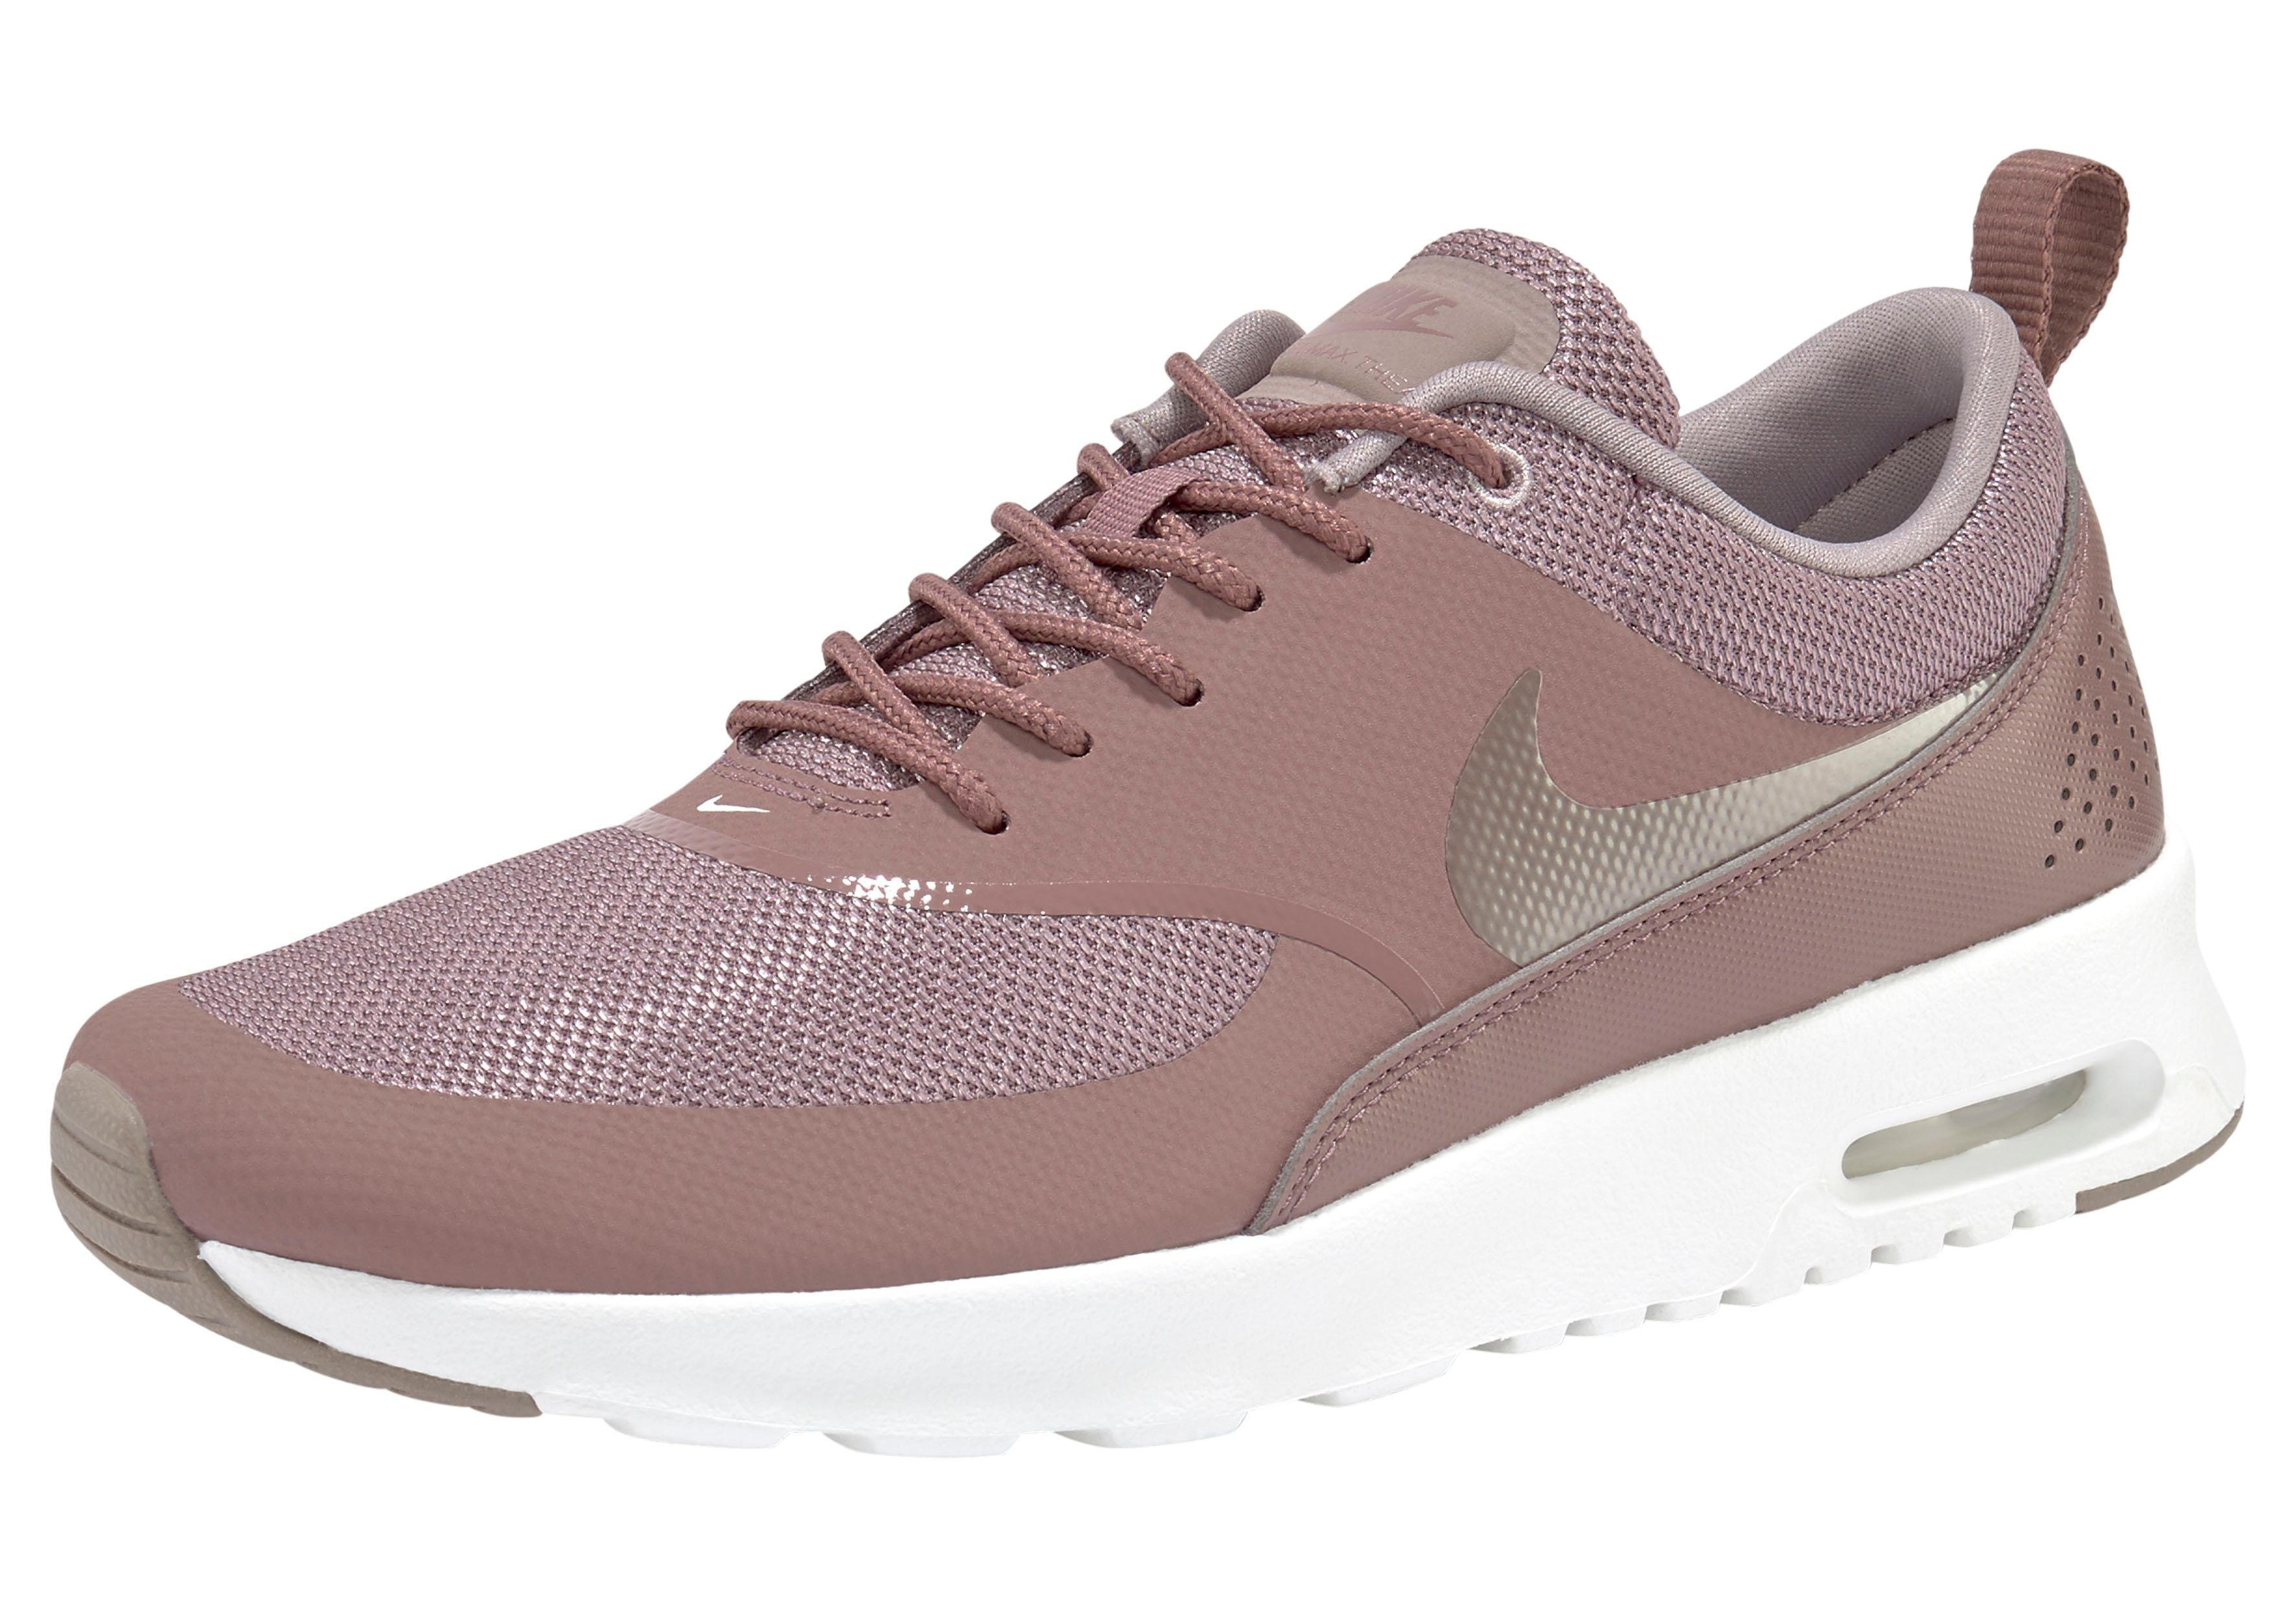 851717dfaf3 ... Nike Sportswear sneakers »Air Max Thea«, Nike Sportswear sneakers »Air  Max Thea«